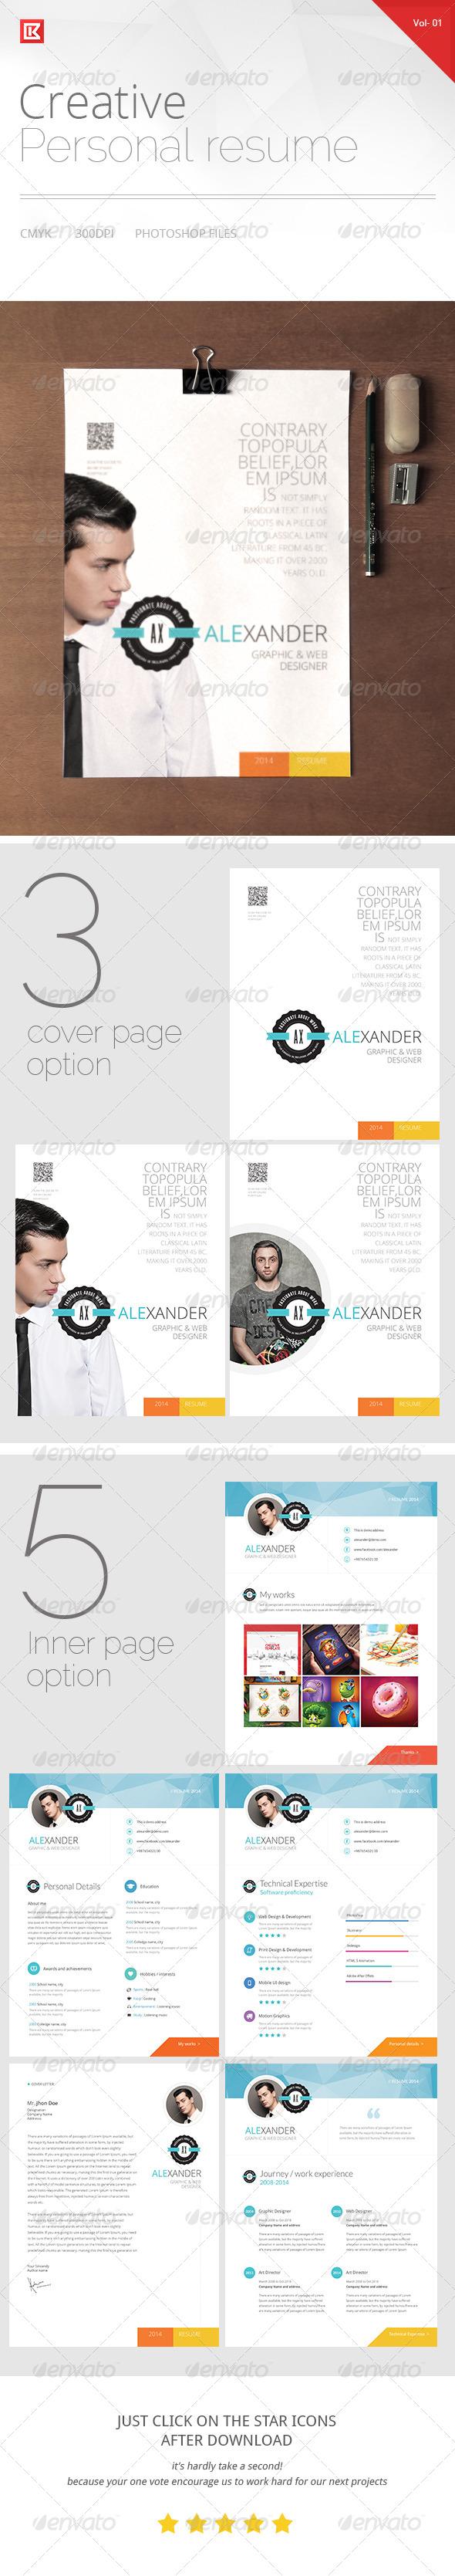 GraphicRiver Creative Personal Resume and CV 8544640